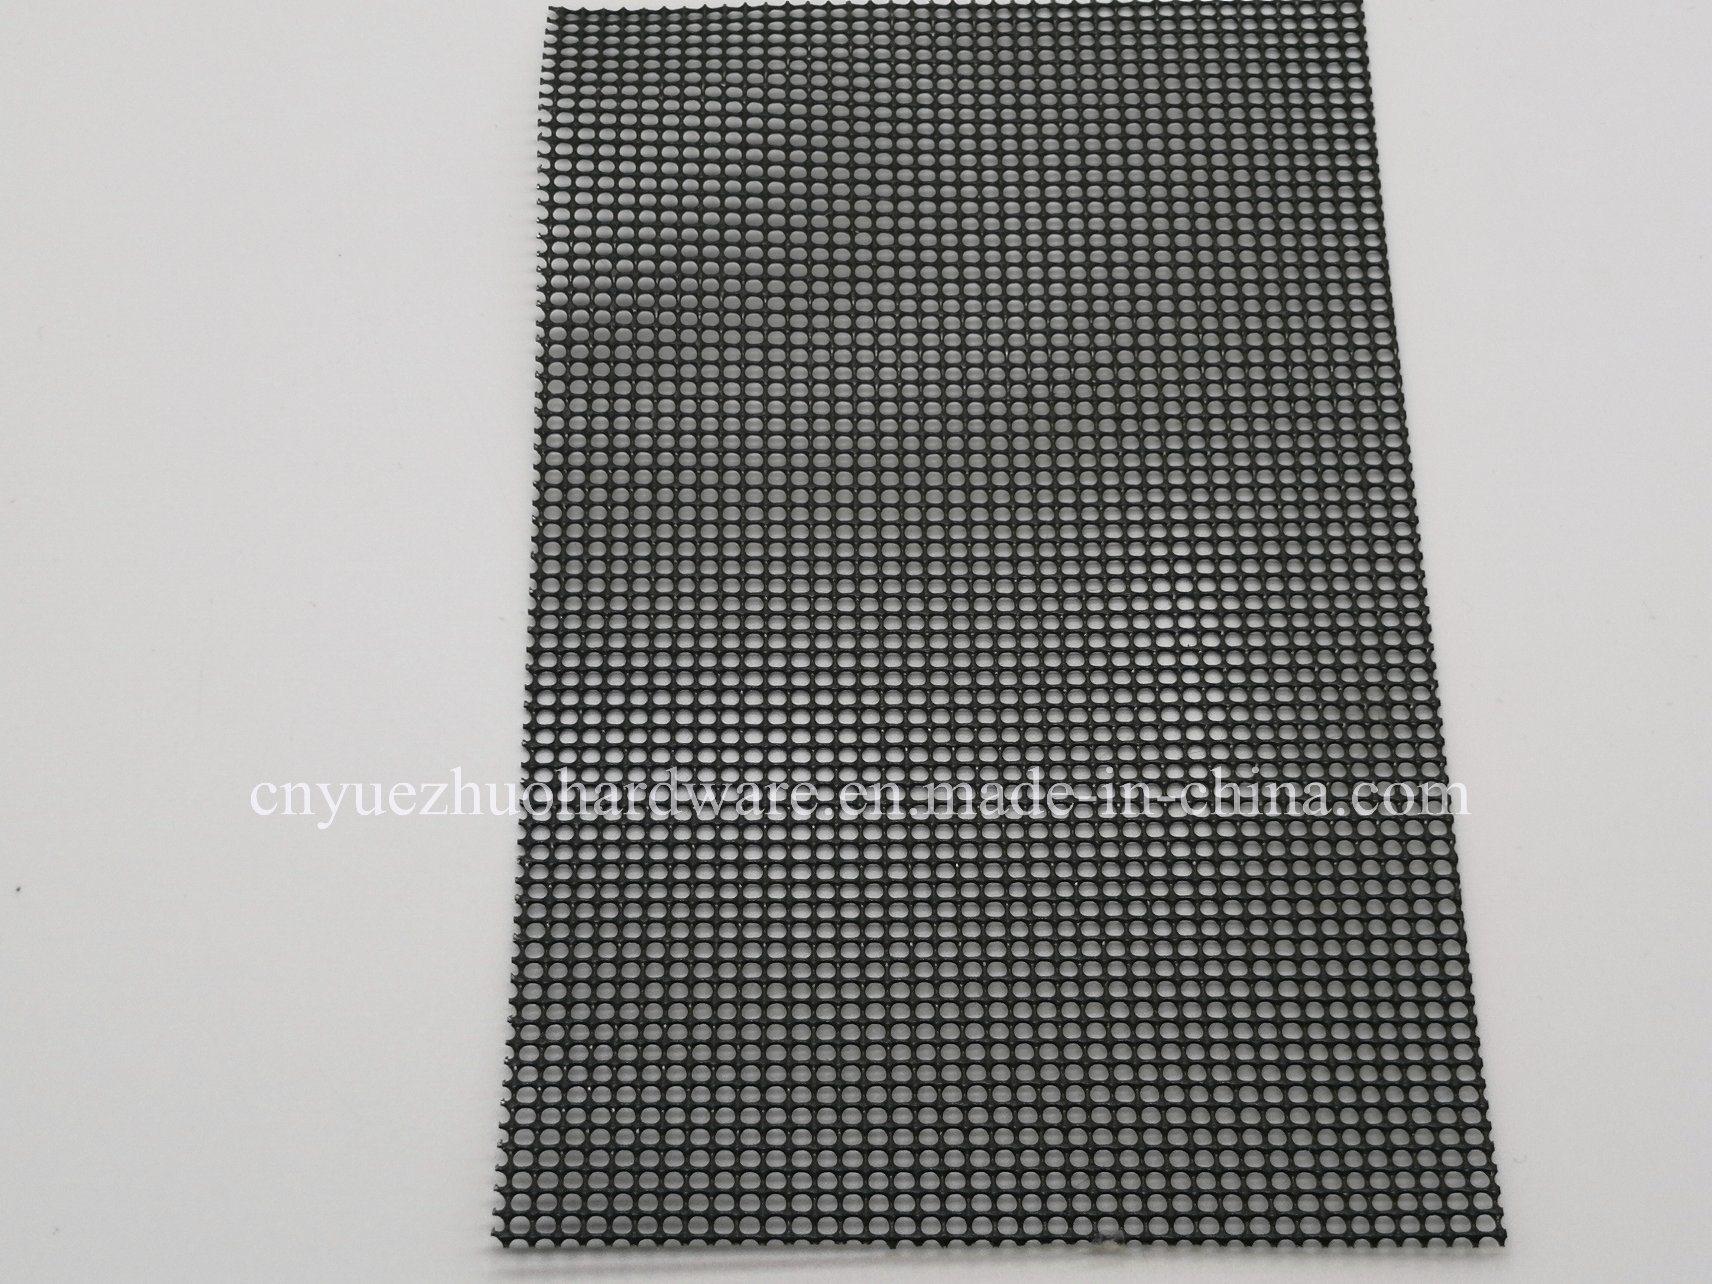 China 304 Stainless Steel Security Window Screen Door And Window